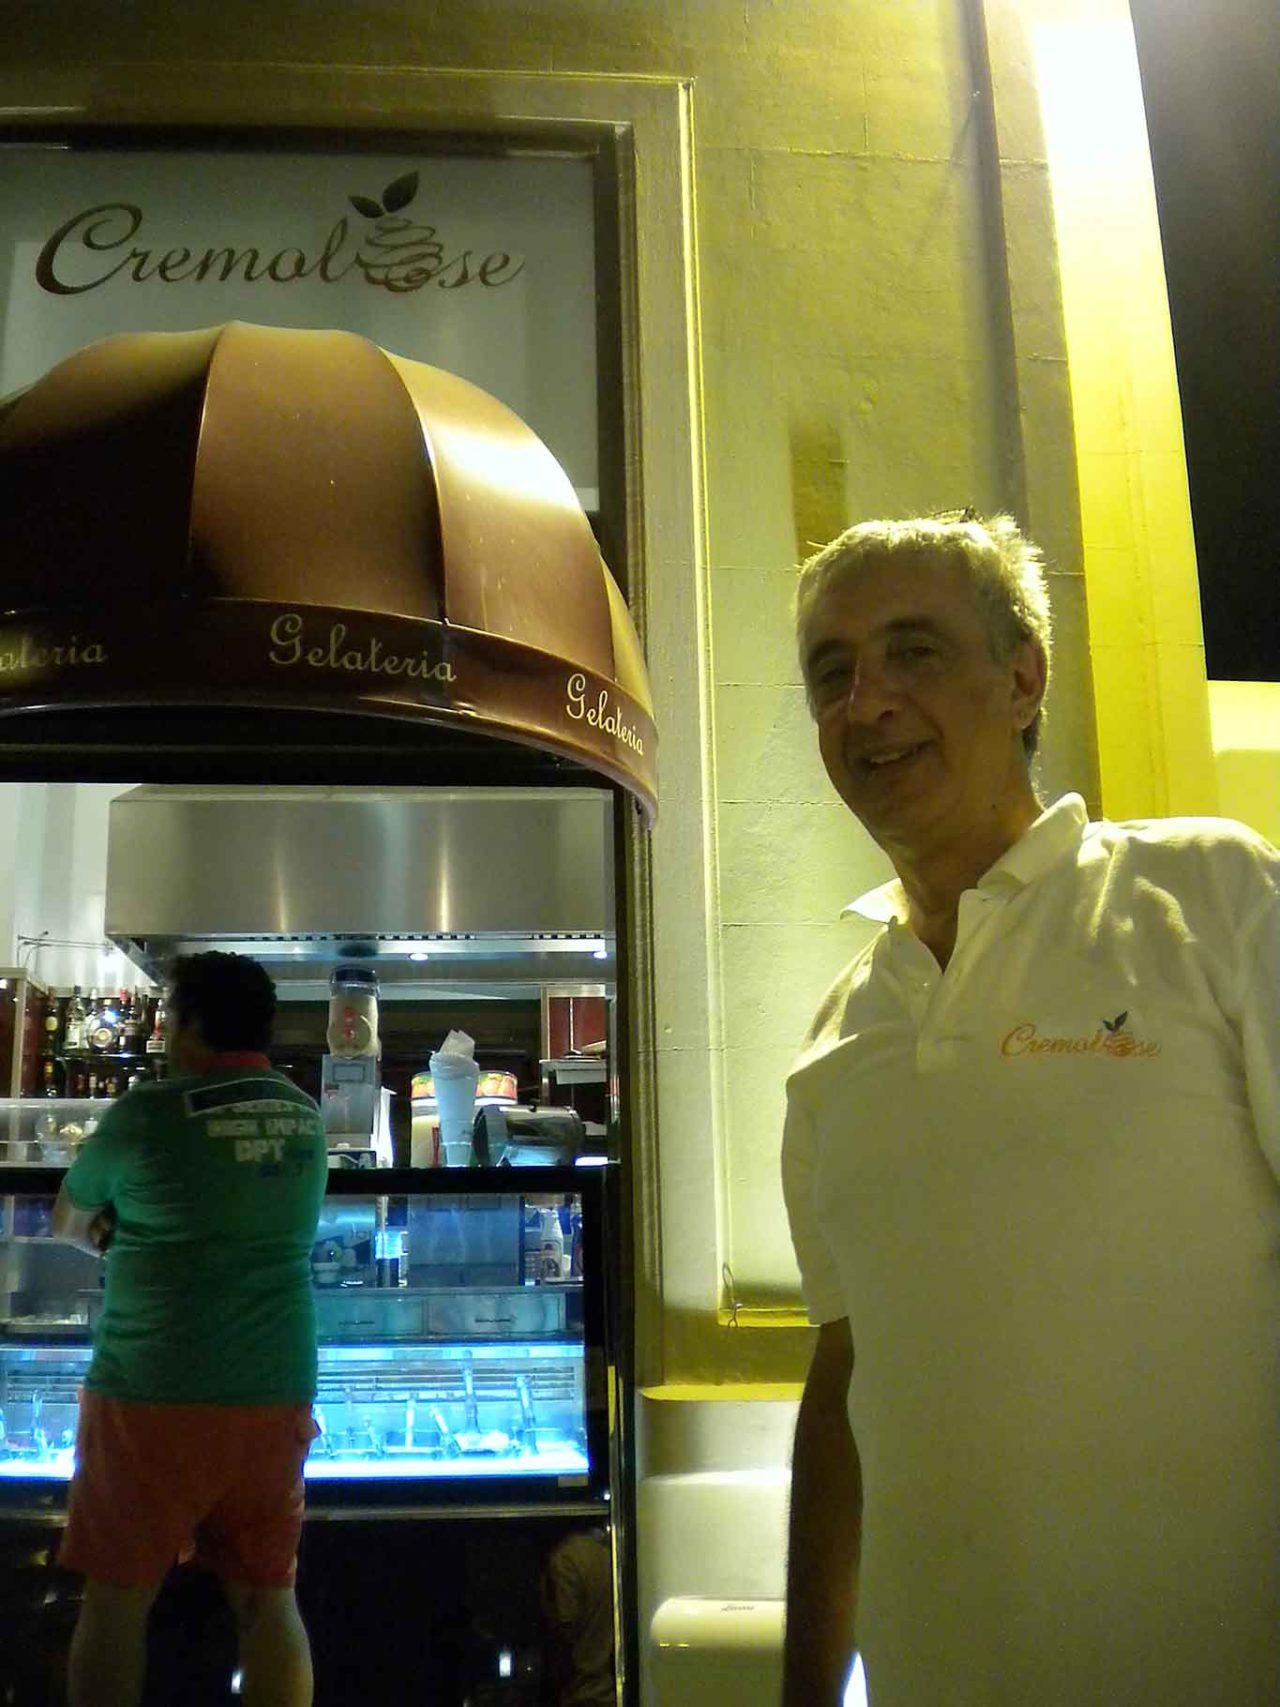 street food a Palermo: Cremolose